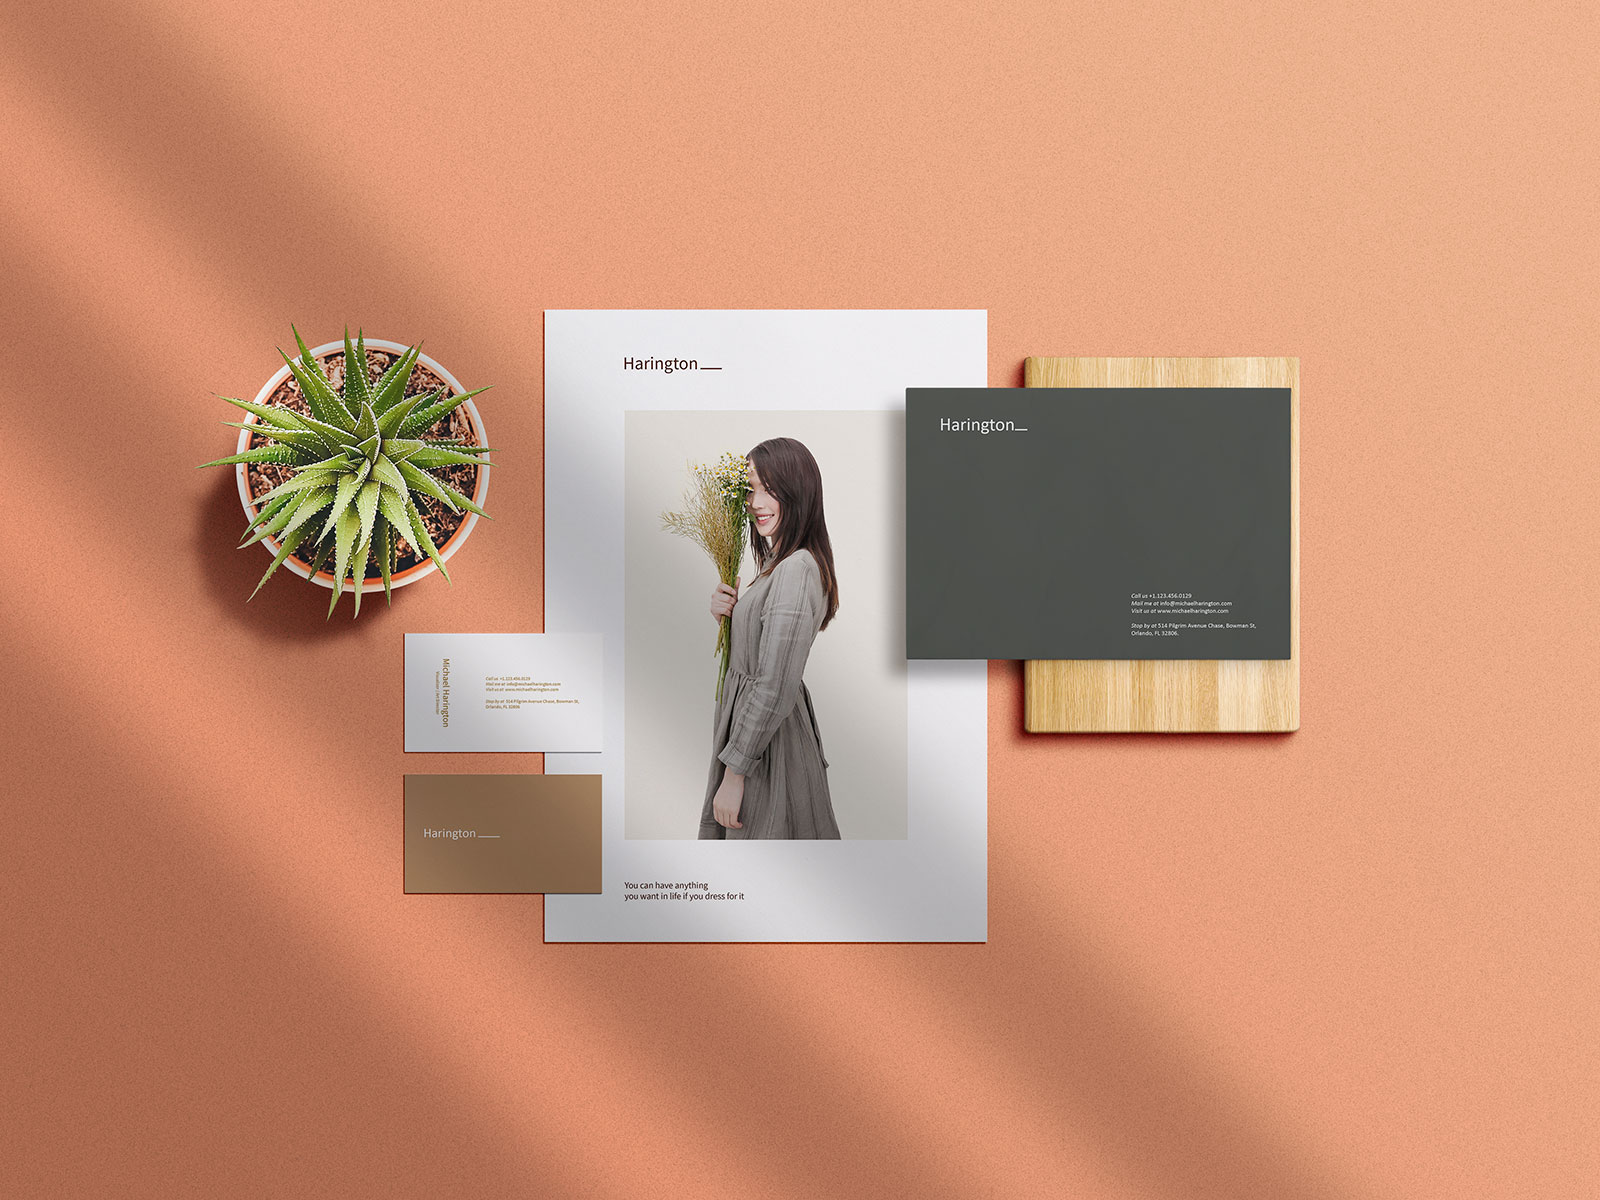 Free-Stationery-Branding-Mockup-PSD-2